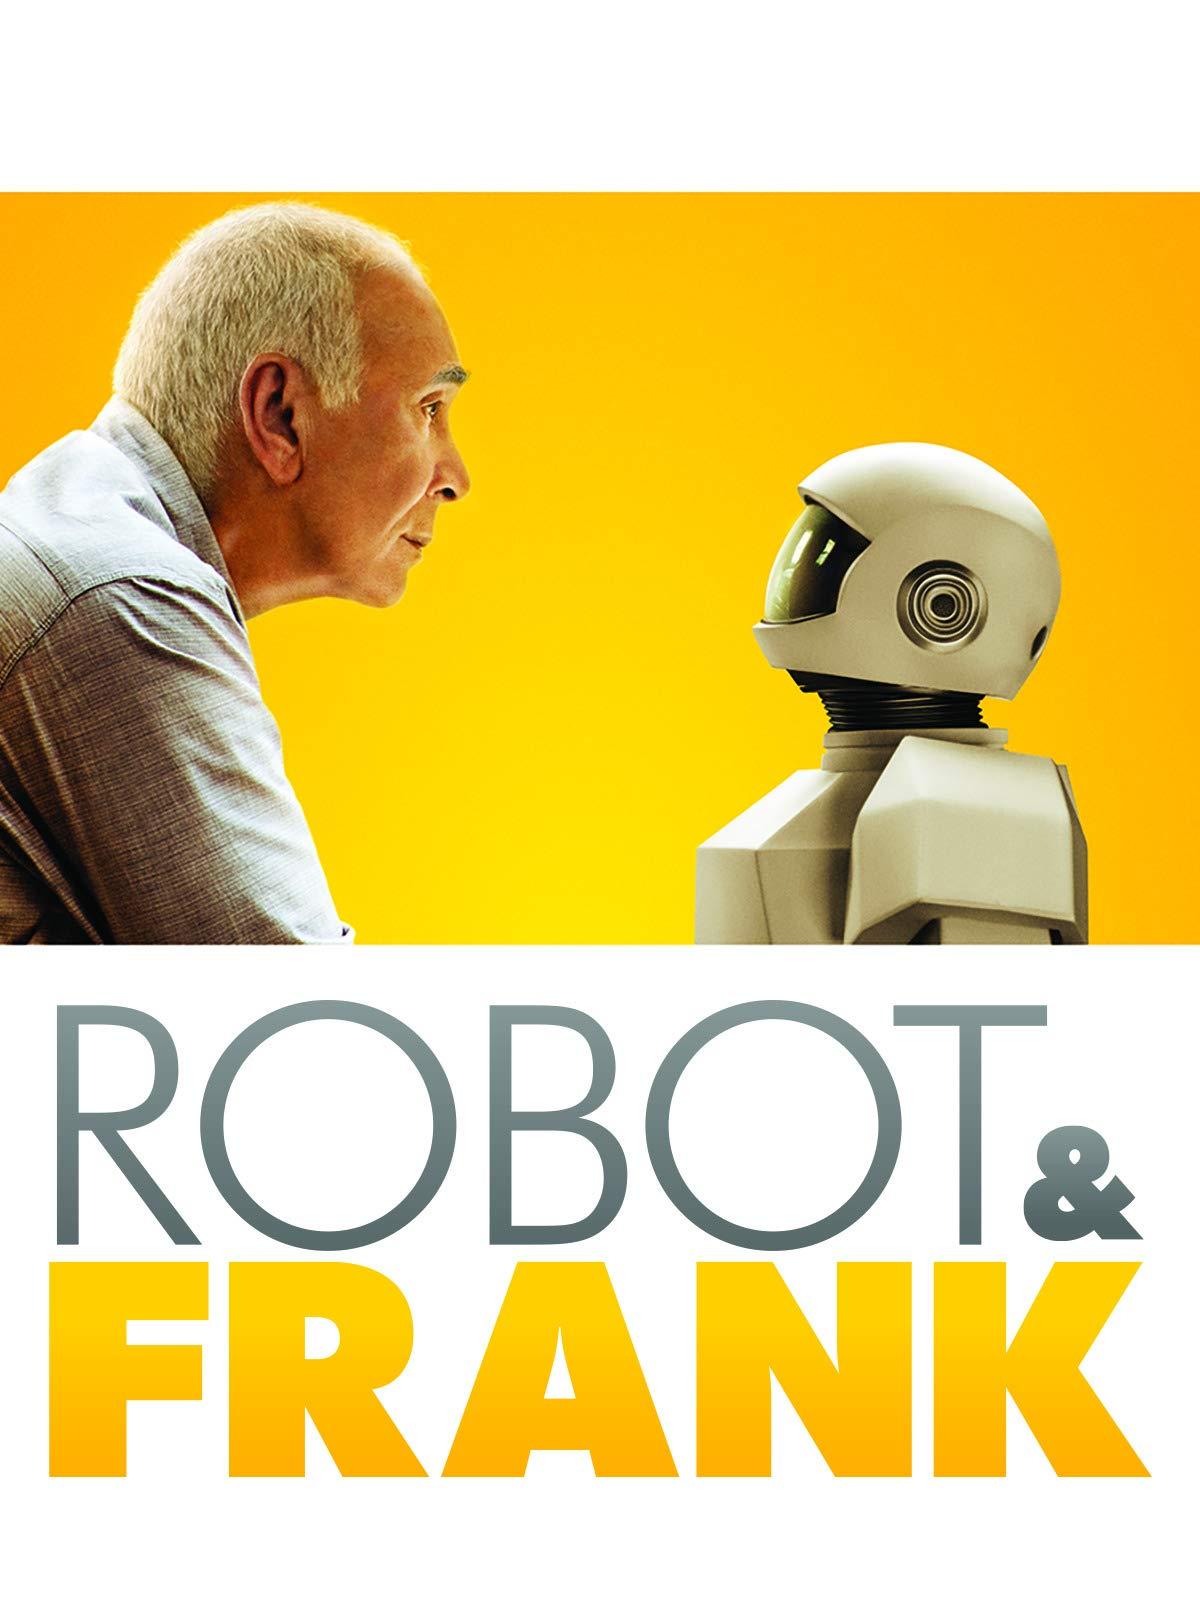 Robot & Frank (2012) Poster #3